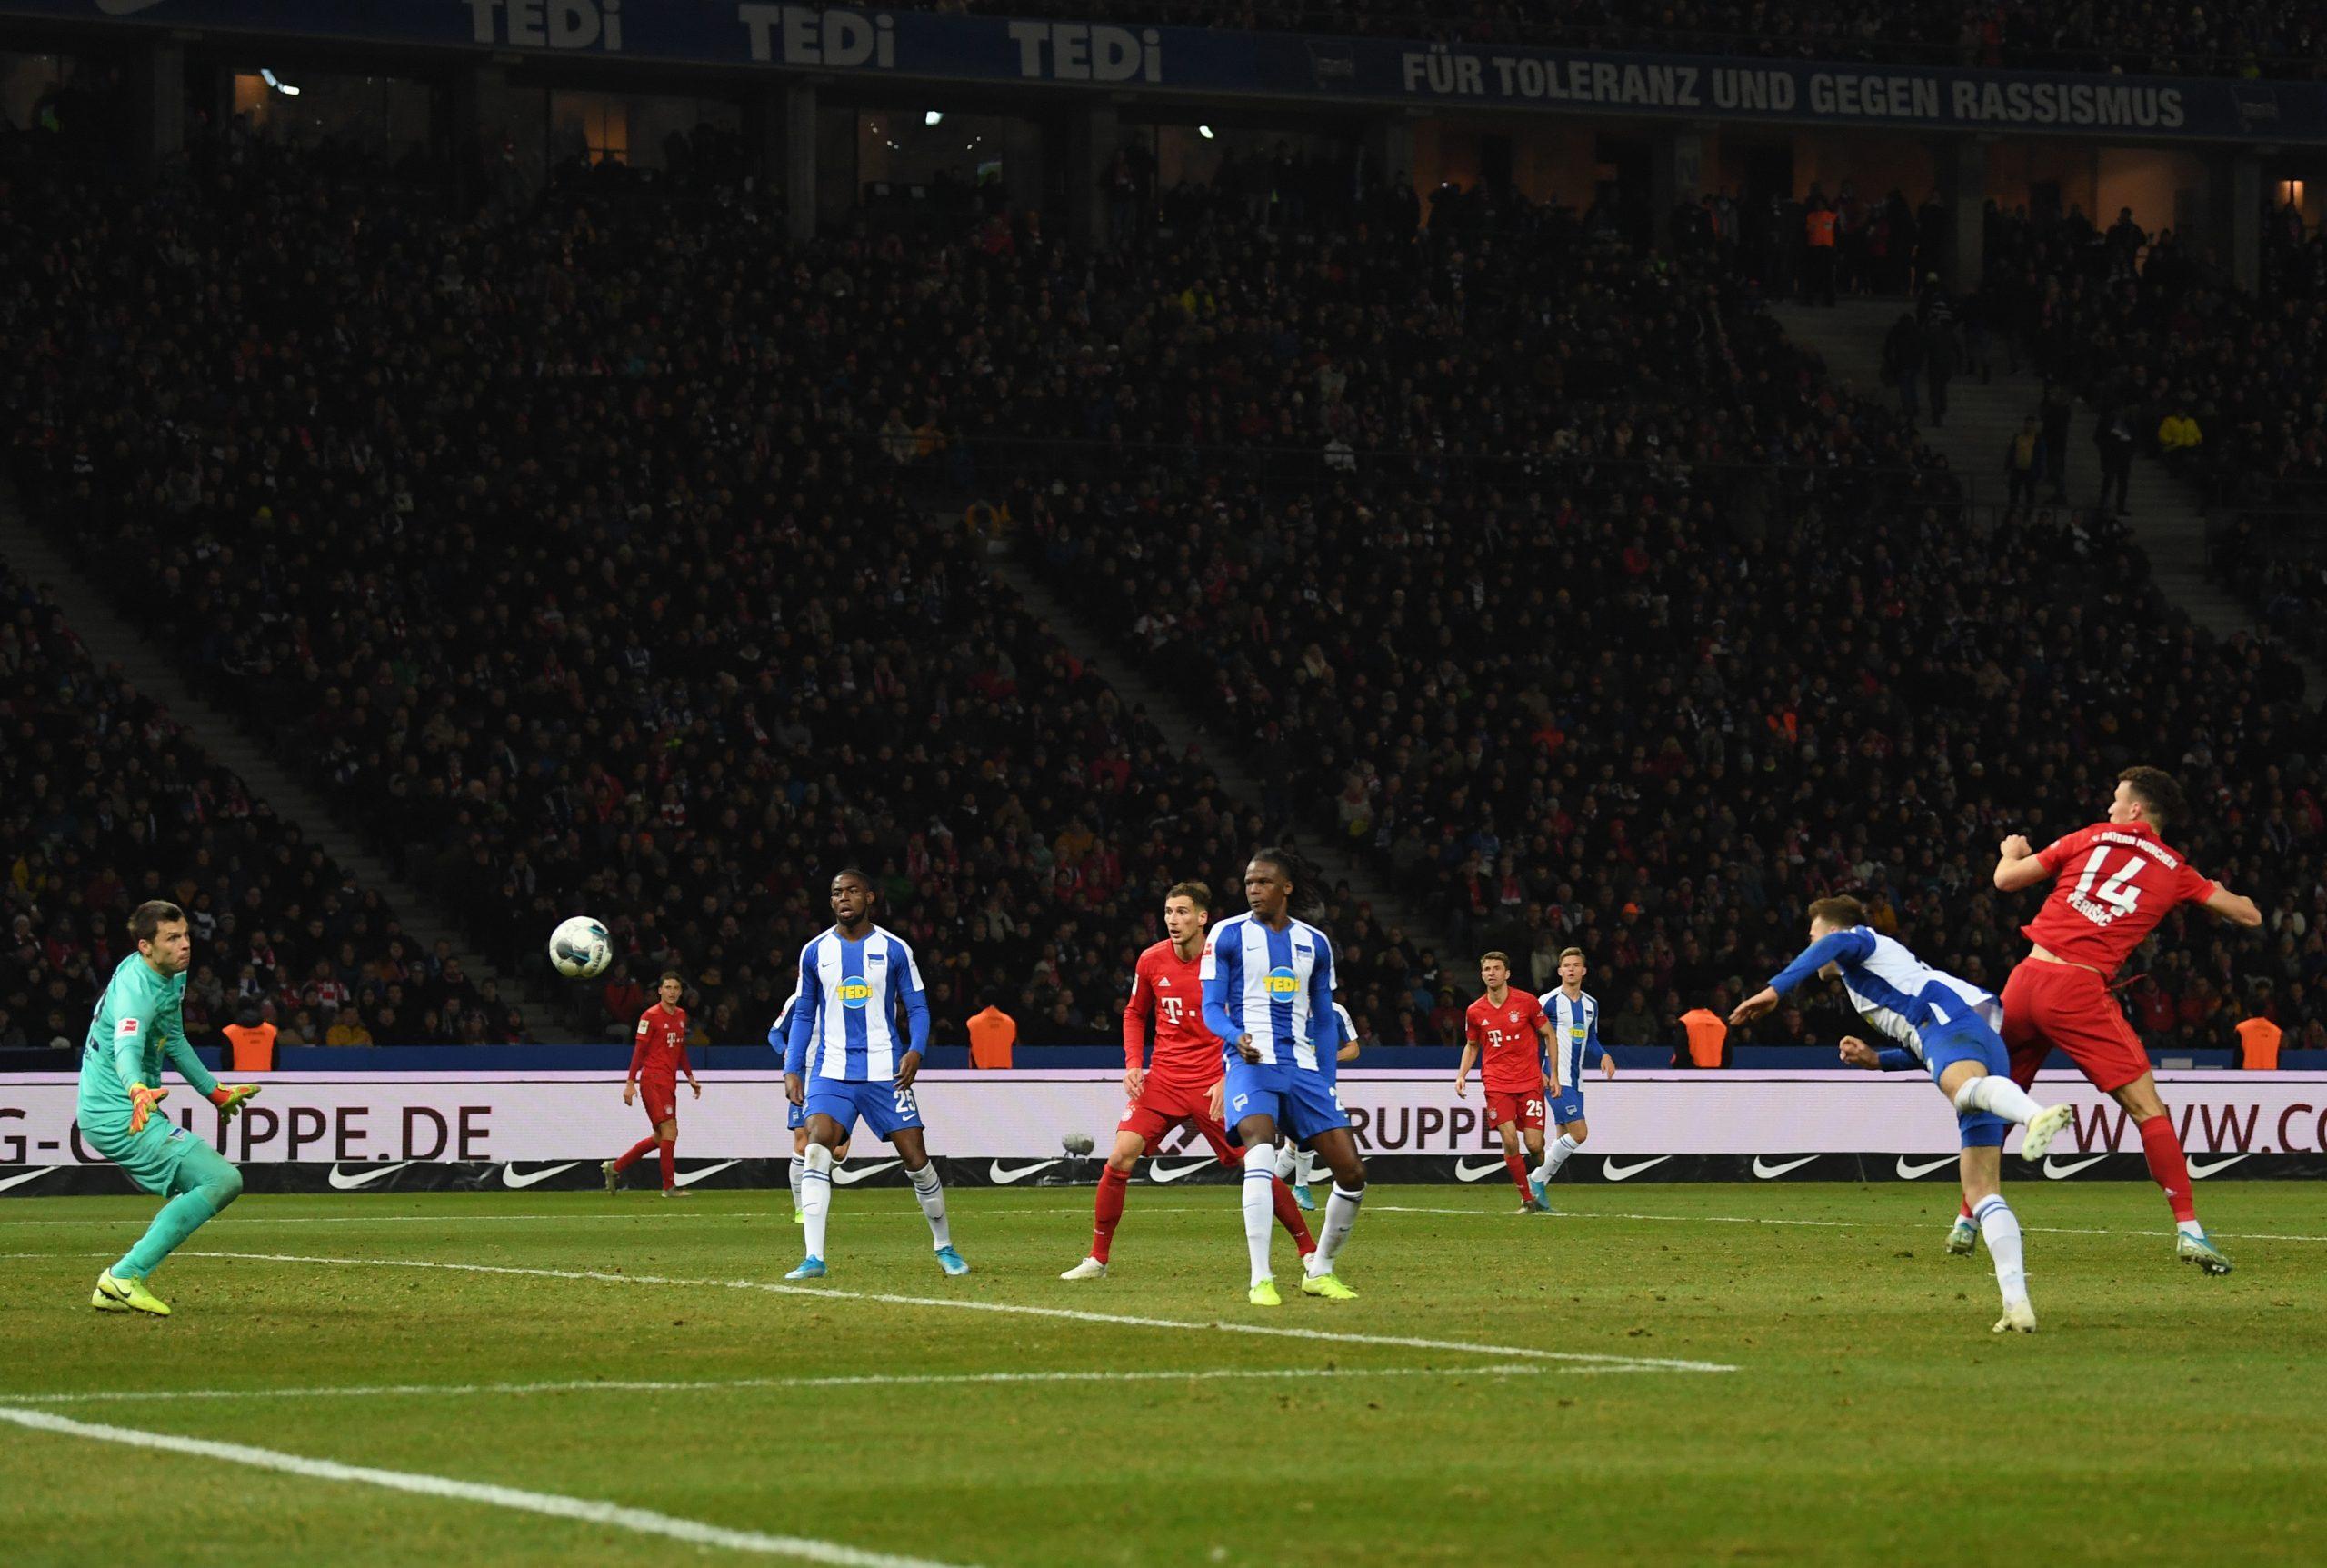 Ivan Perisic scores Bayern's fourth goal during the Bundesliga match: Hertha vs Bayern München